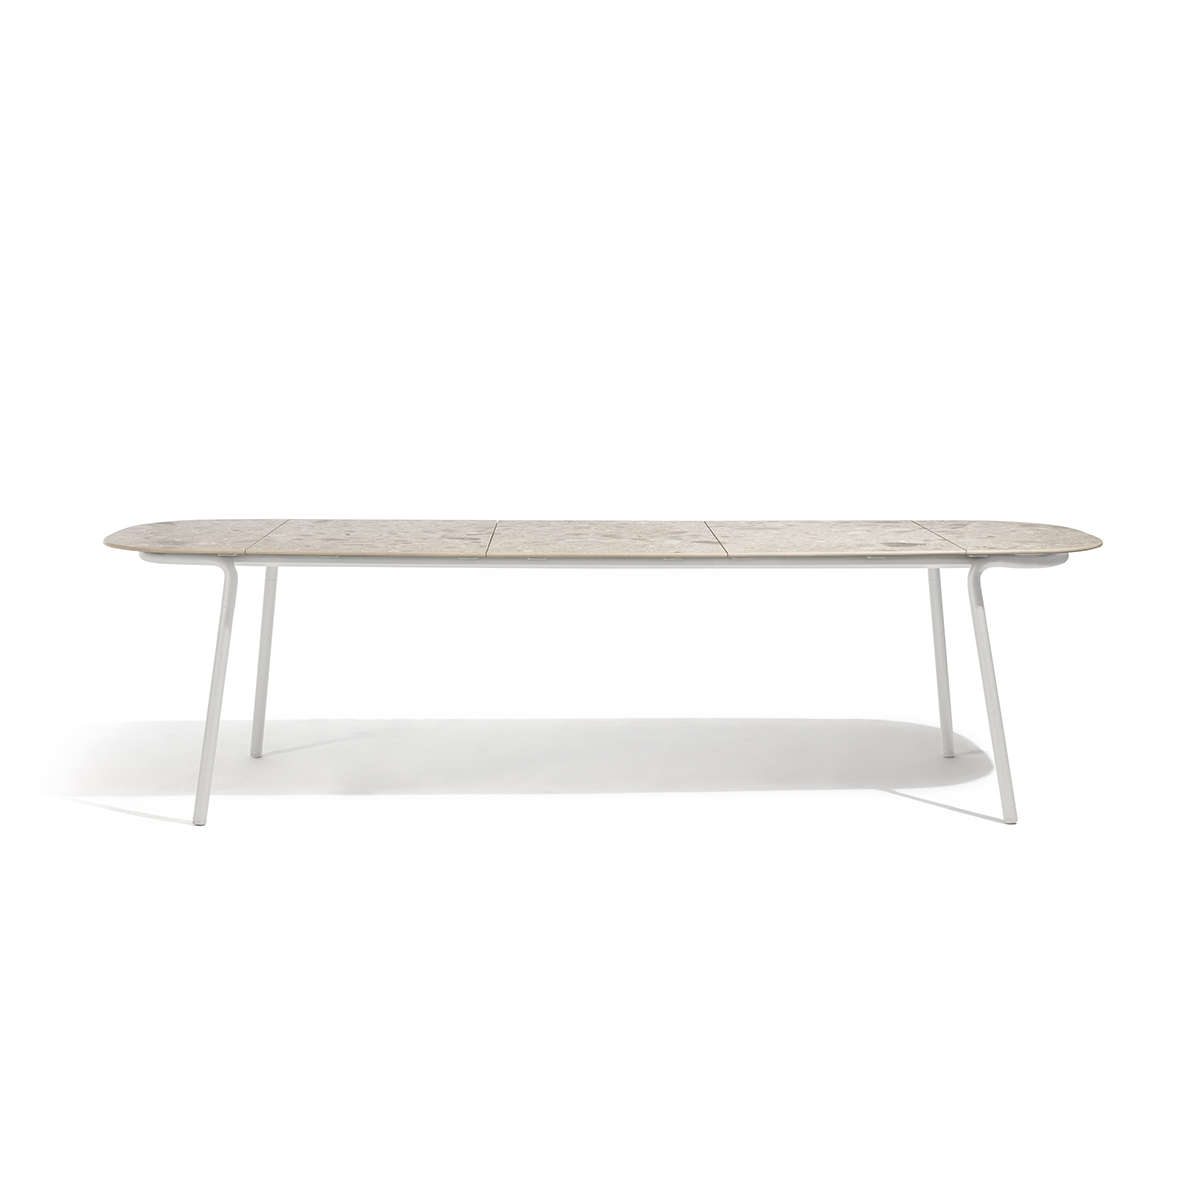 Manutti Torsa Dining Table Cut Out 1